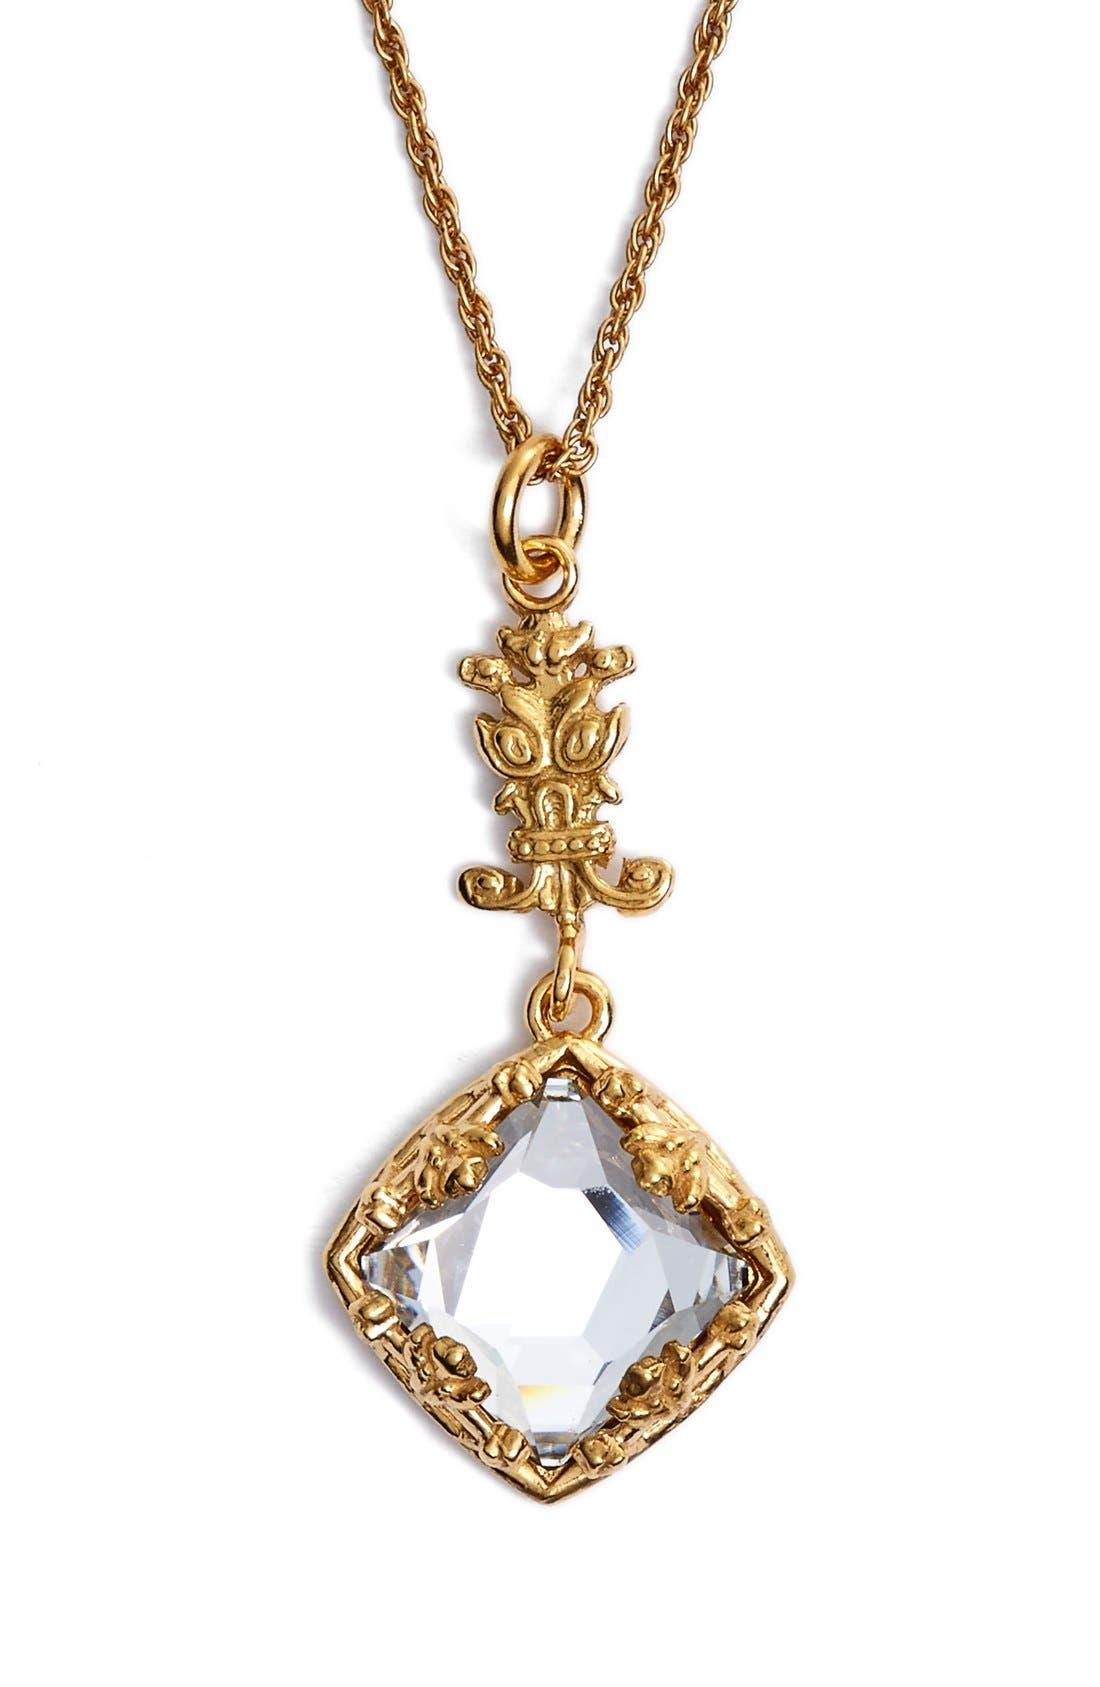 Alternate Image 1 Selected - Virgins Saints & Angels 'Captain Hook - Treasure' Charm Necklace